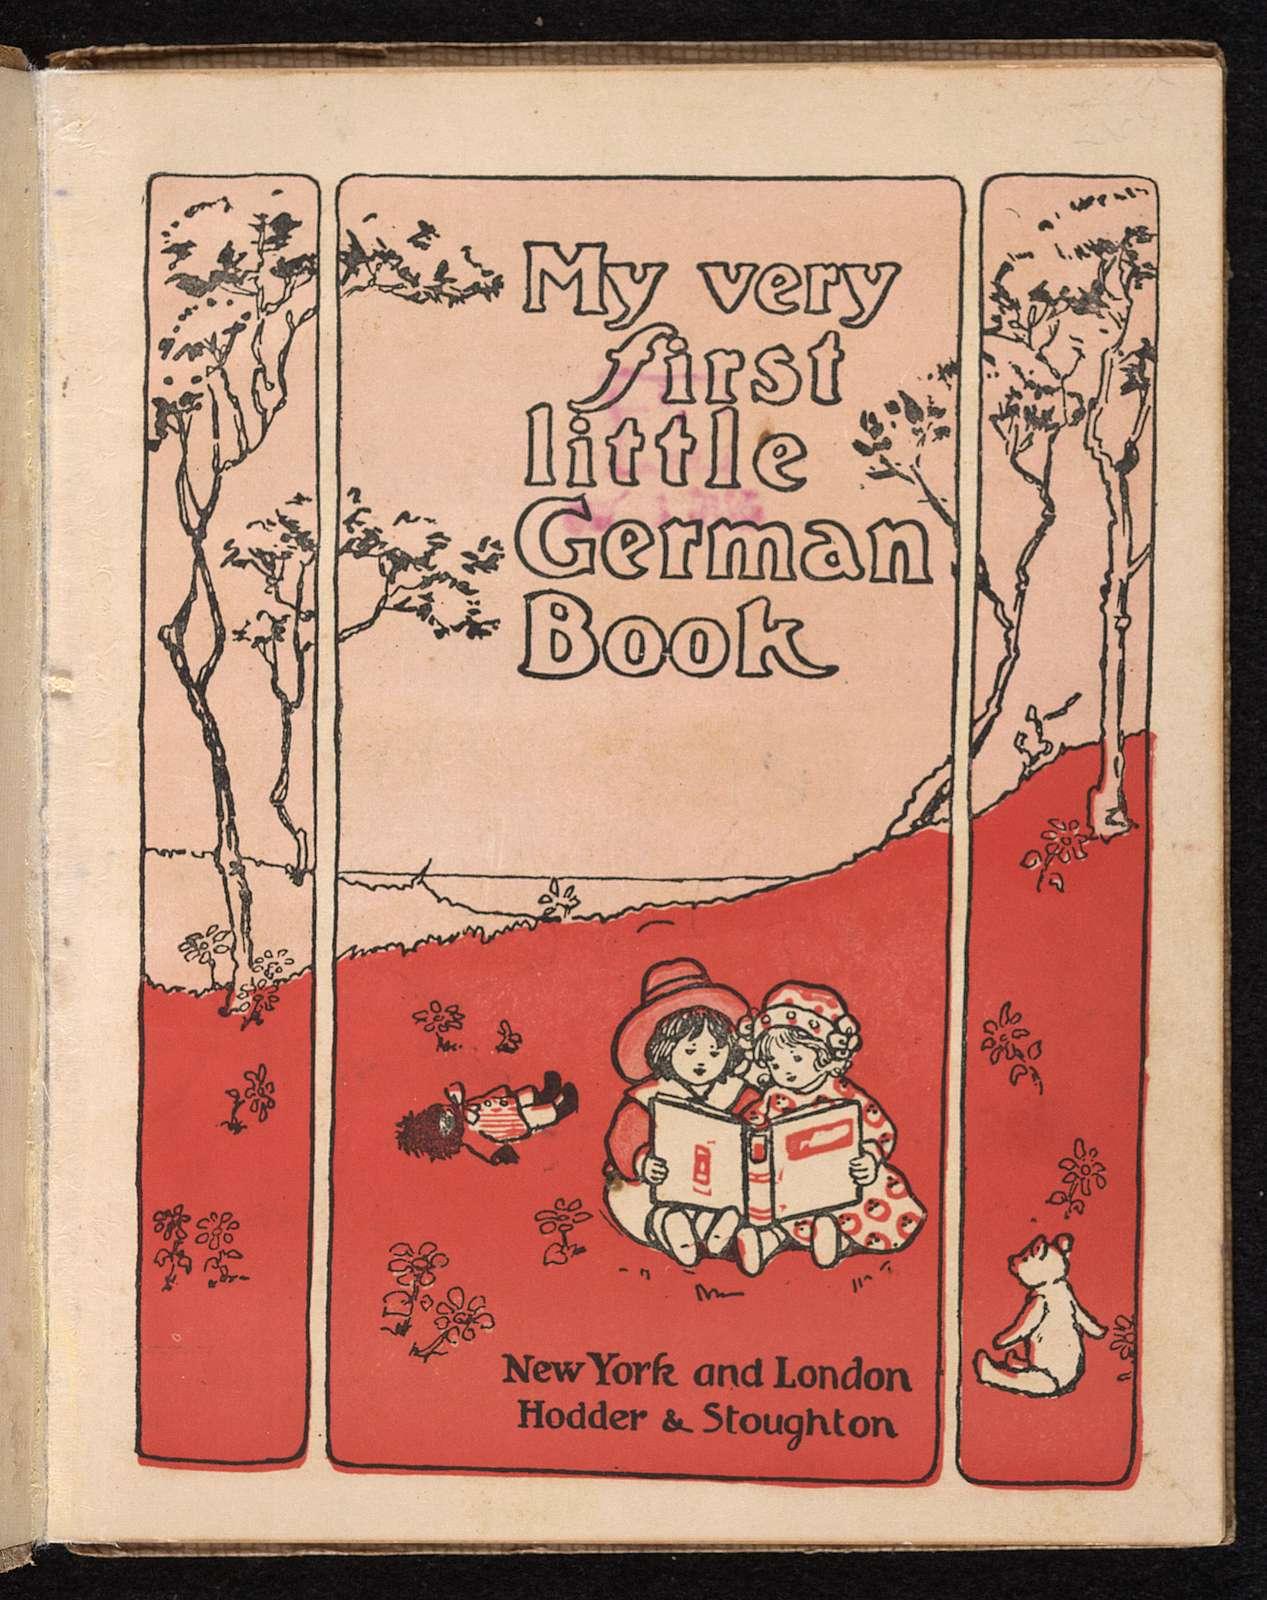 My very first little German book.